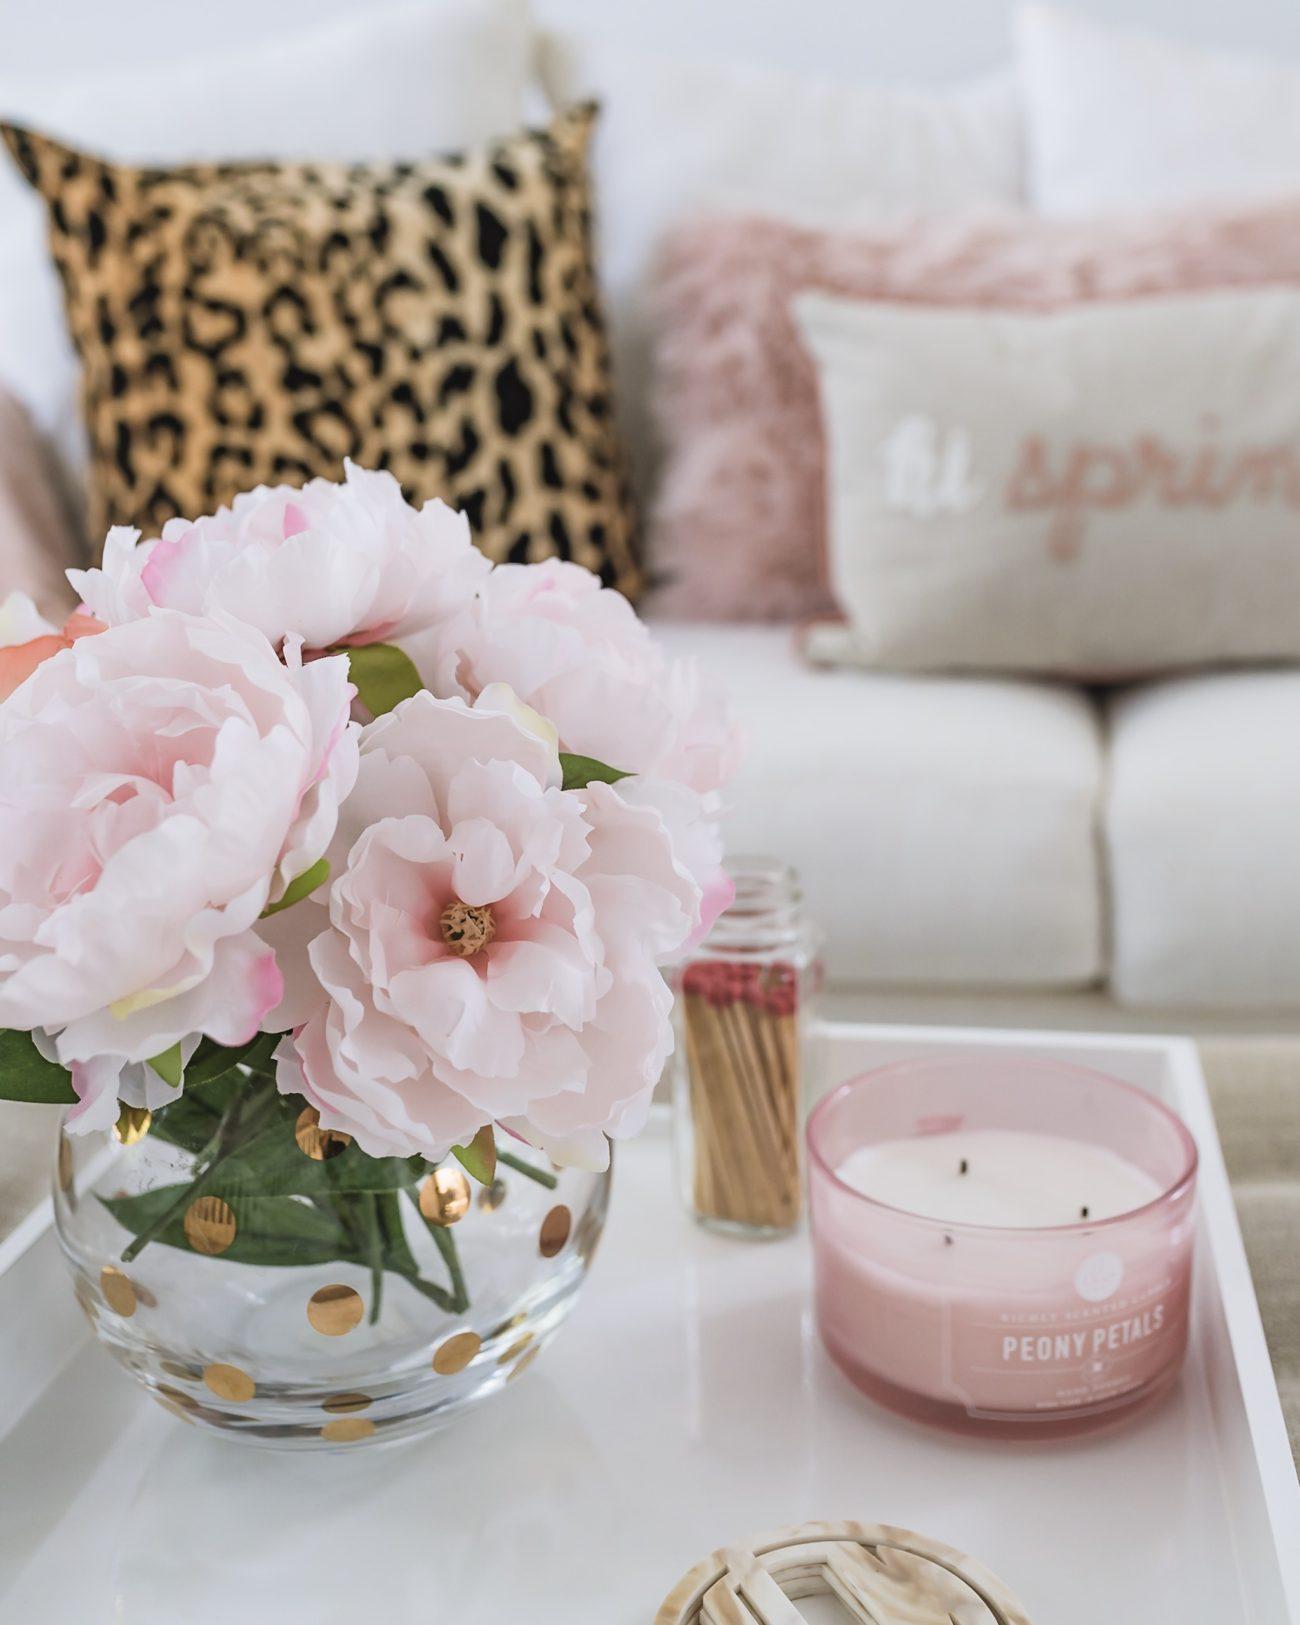 Room Fragrance Gift Ideas